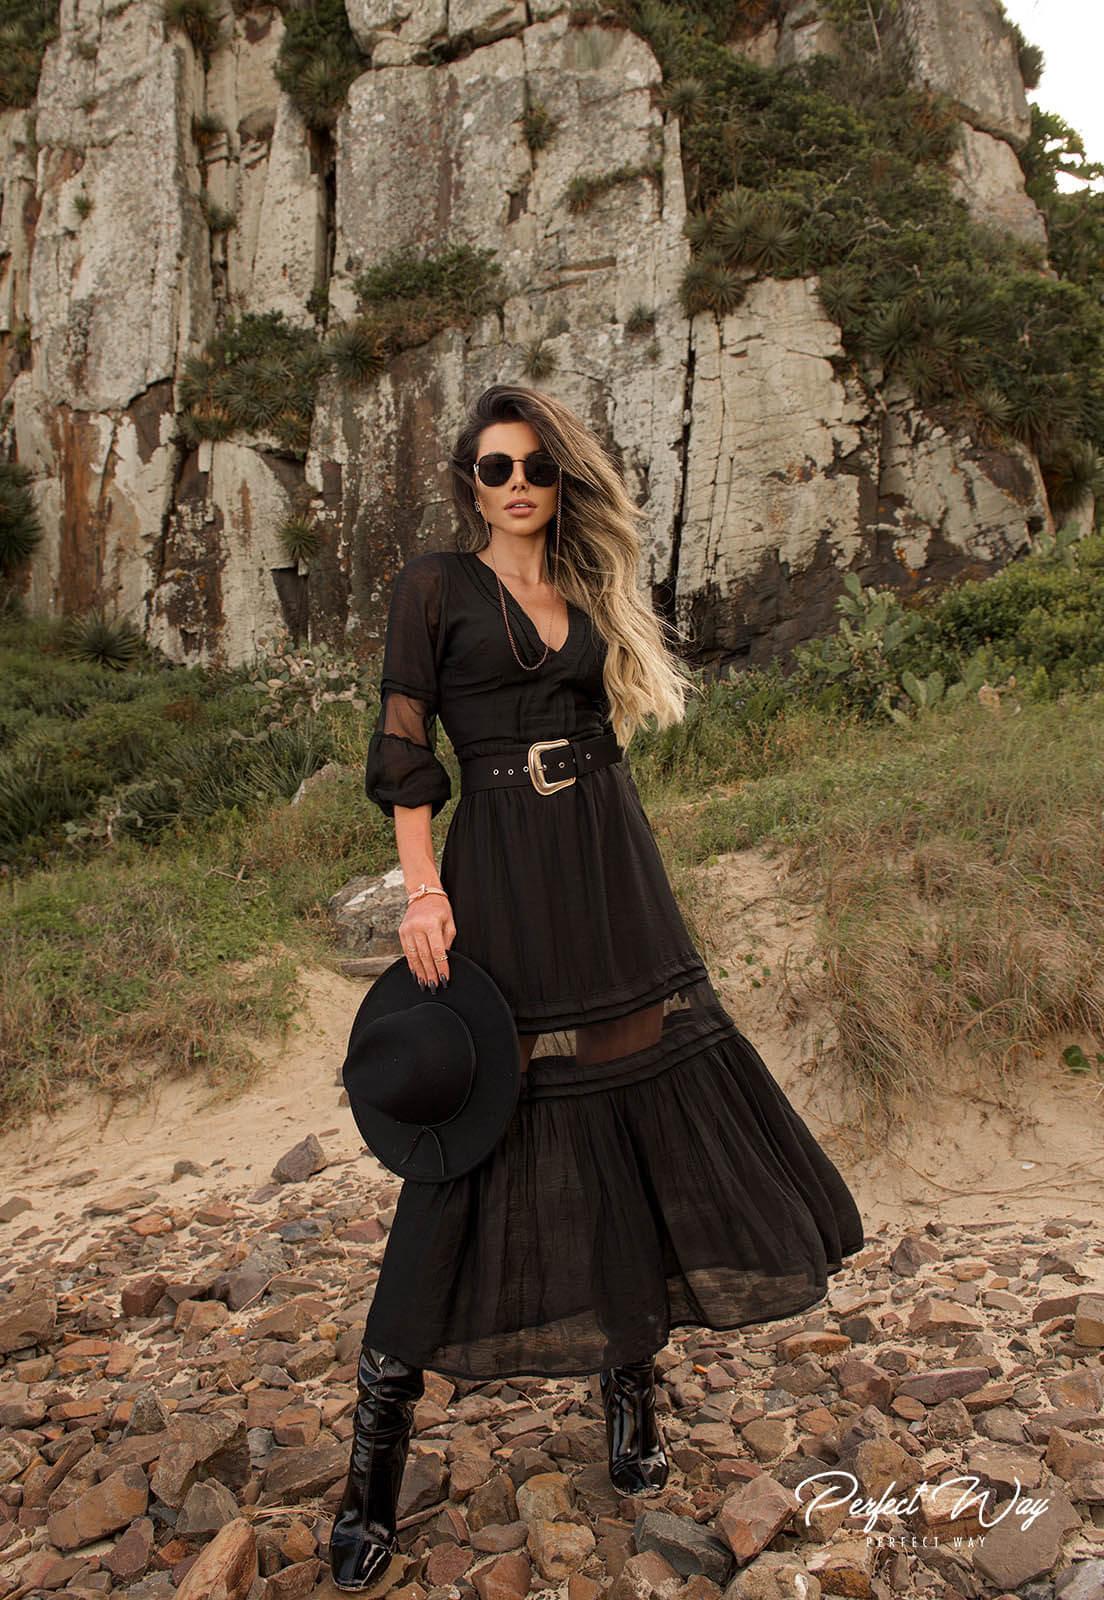 Perfect Way - vestido renda  chantilly e tule + cinto